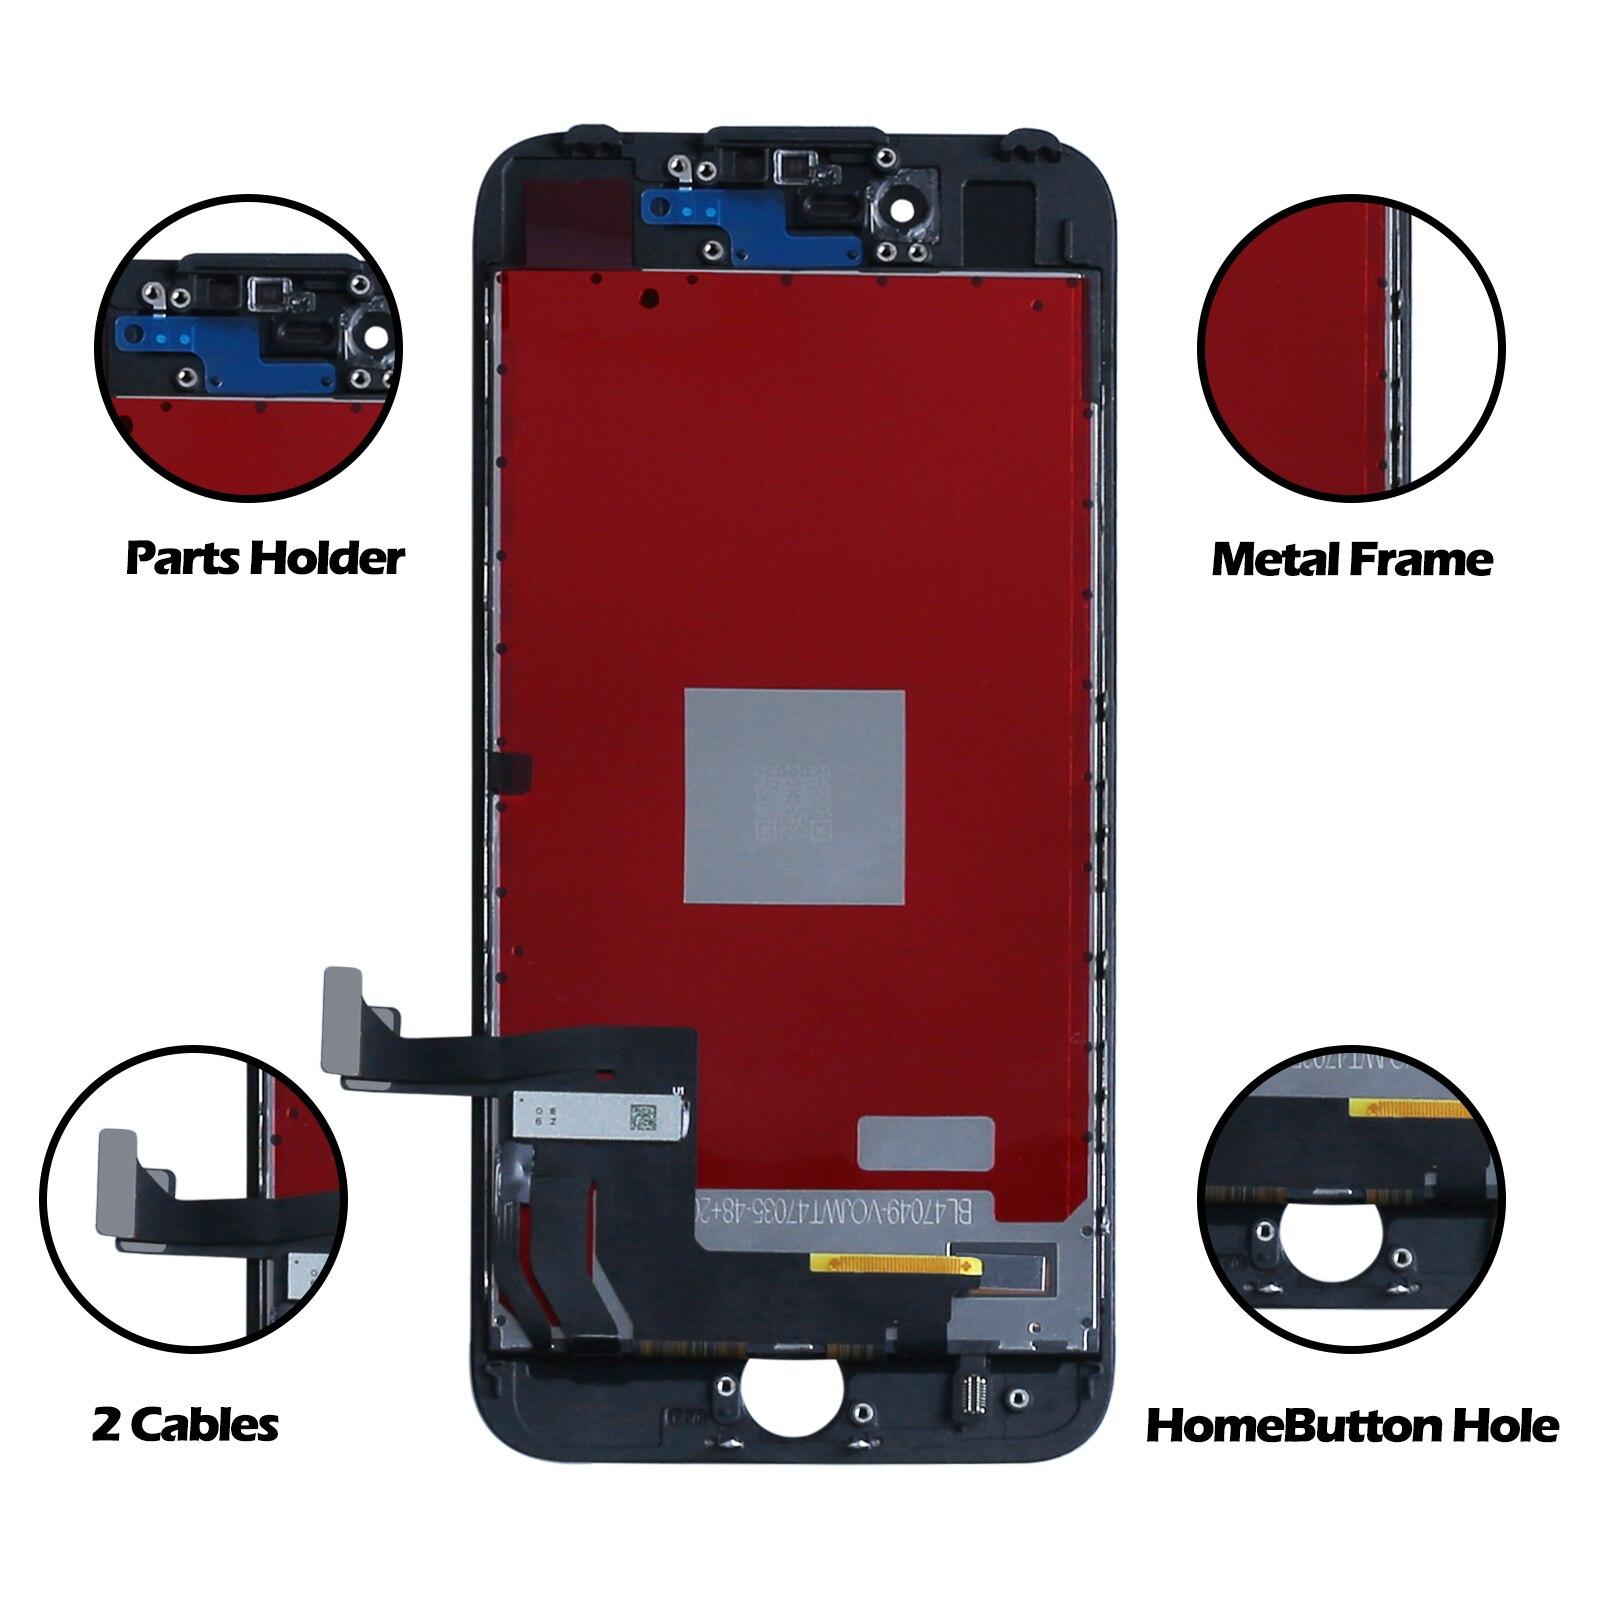 SE2 قطع غيار للشاشة LCD ل SE2020 مجموعة المحولات الرقمية لشاشة تعمل بلمس عدة أدوات العرض لا كاميرا زر المنزل SE2 LCD